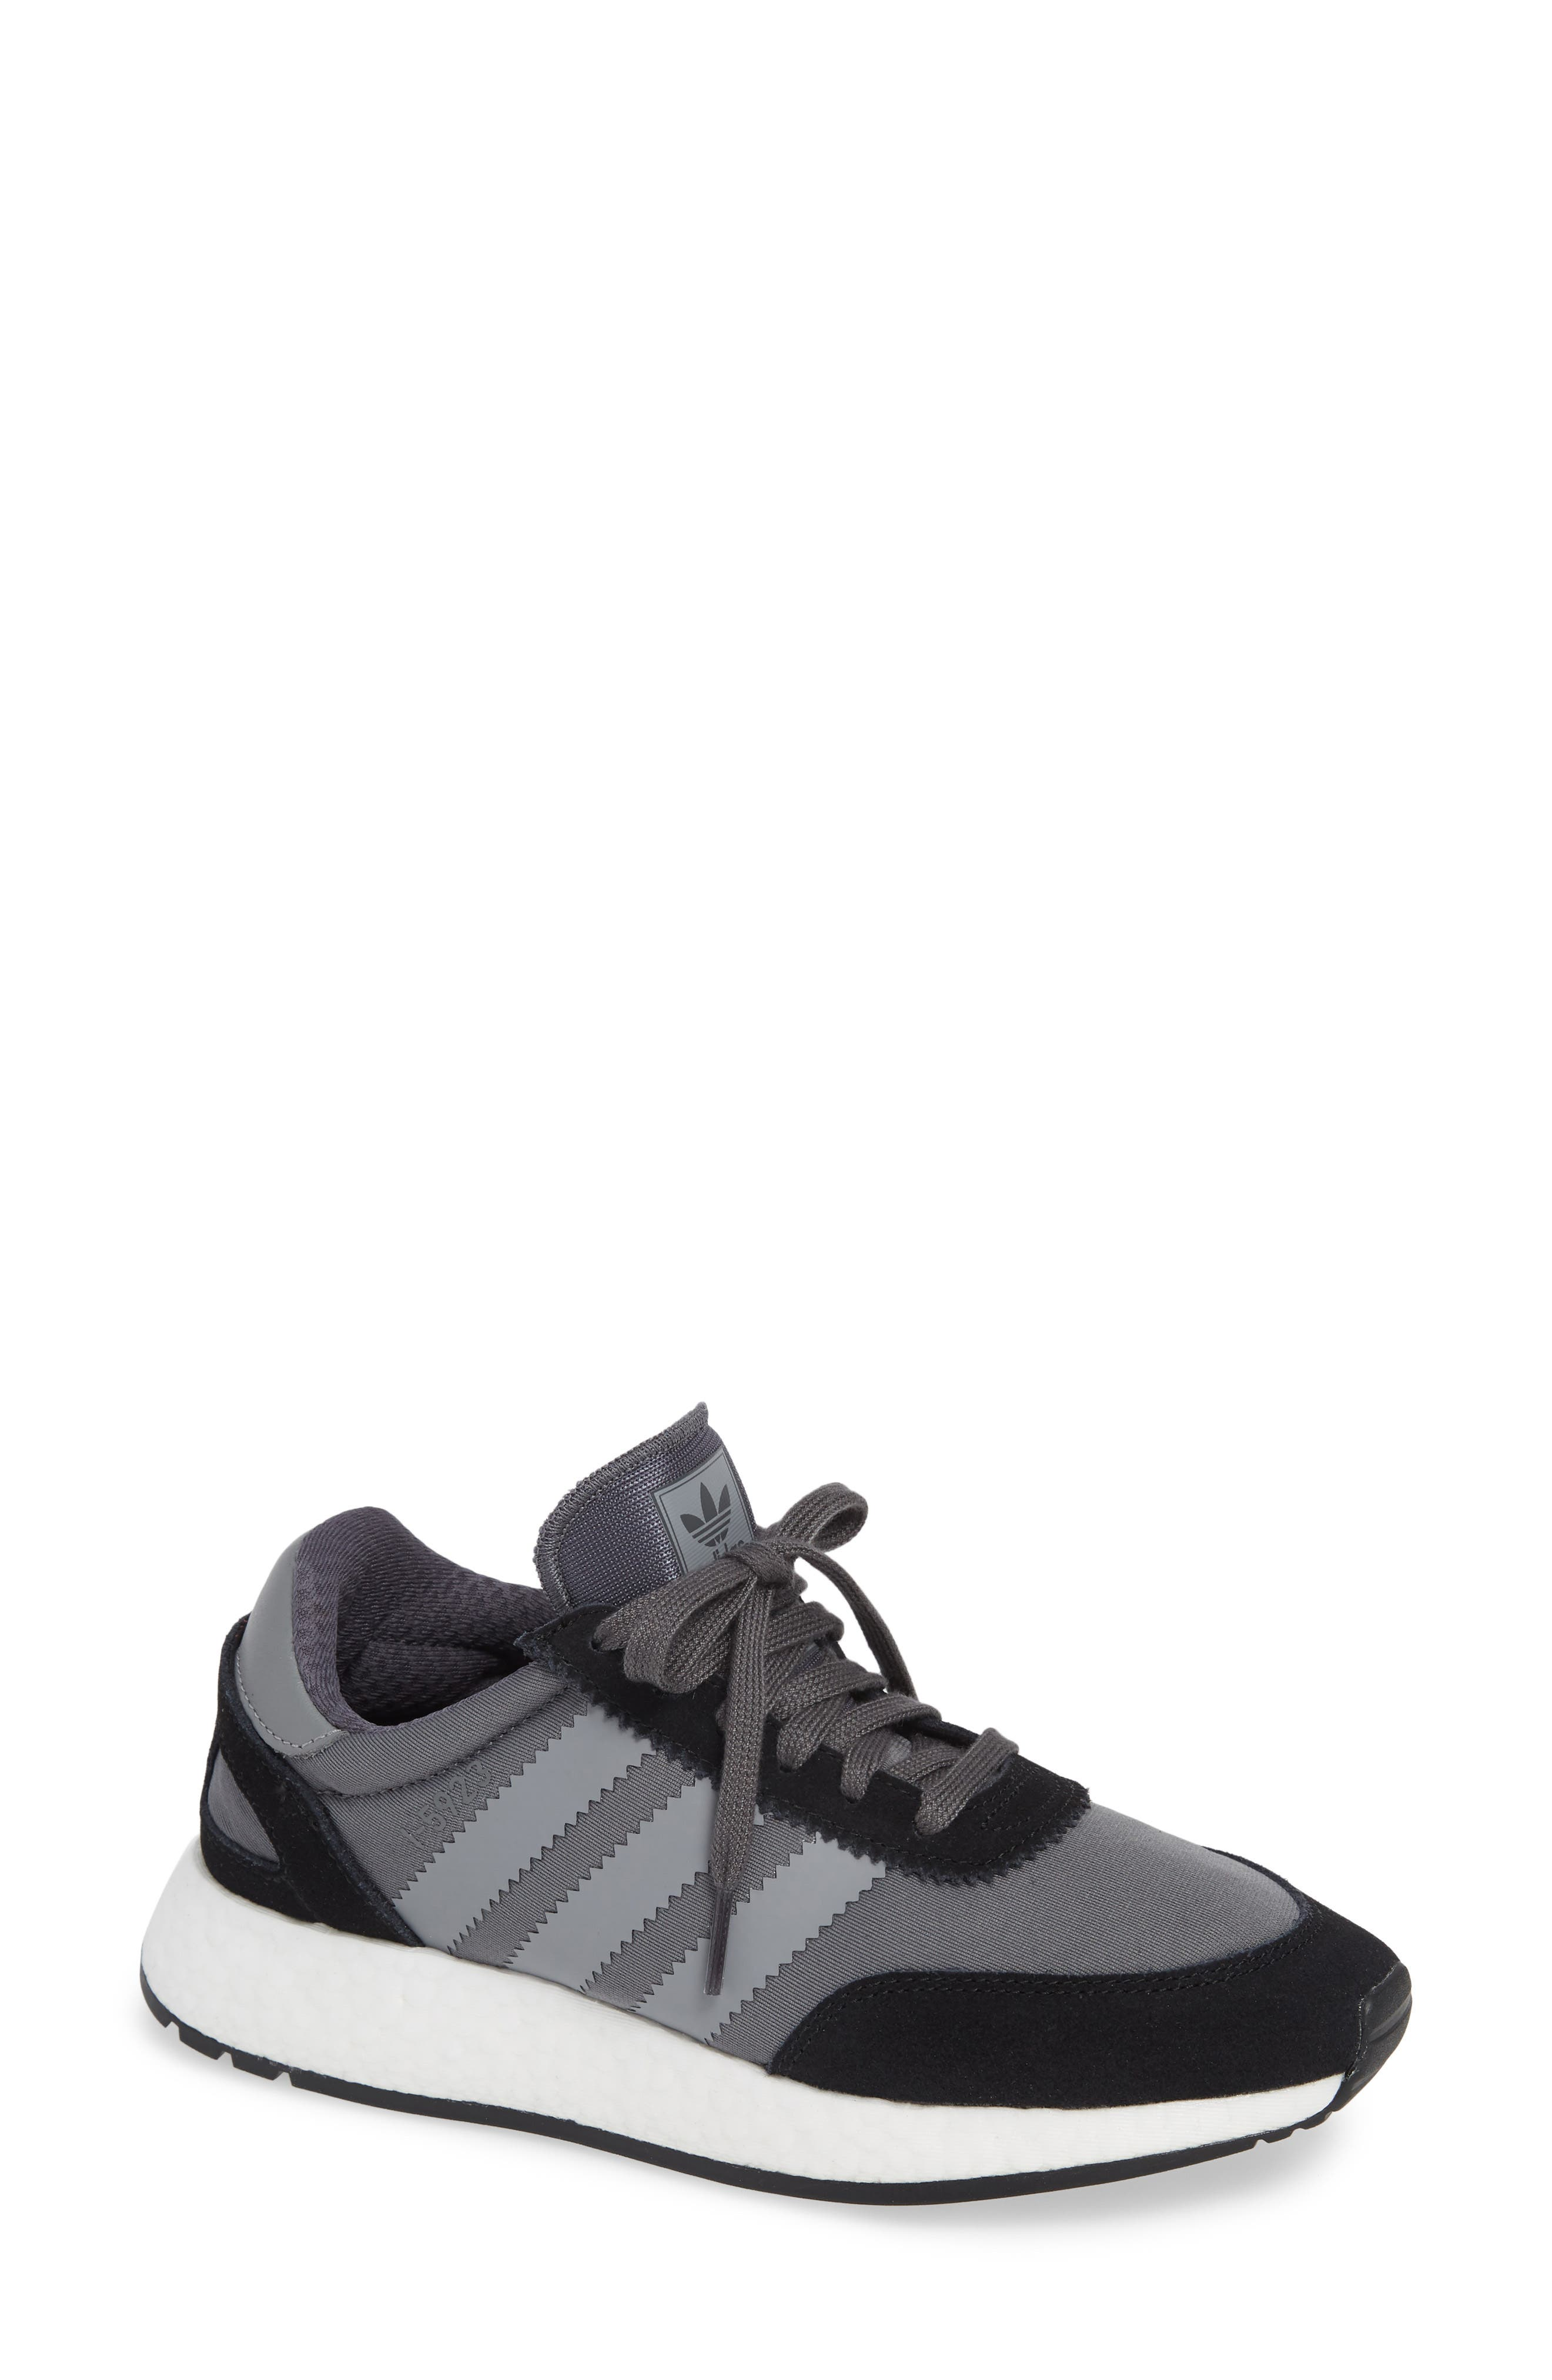 I-5923 Sneaker,                         Main,                         color, BLACK/ GREY THREE/ GREY FIVE